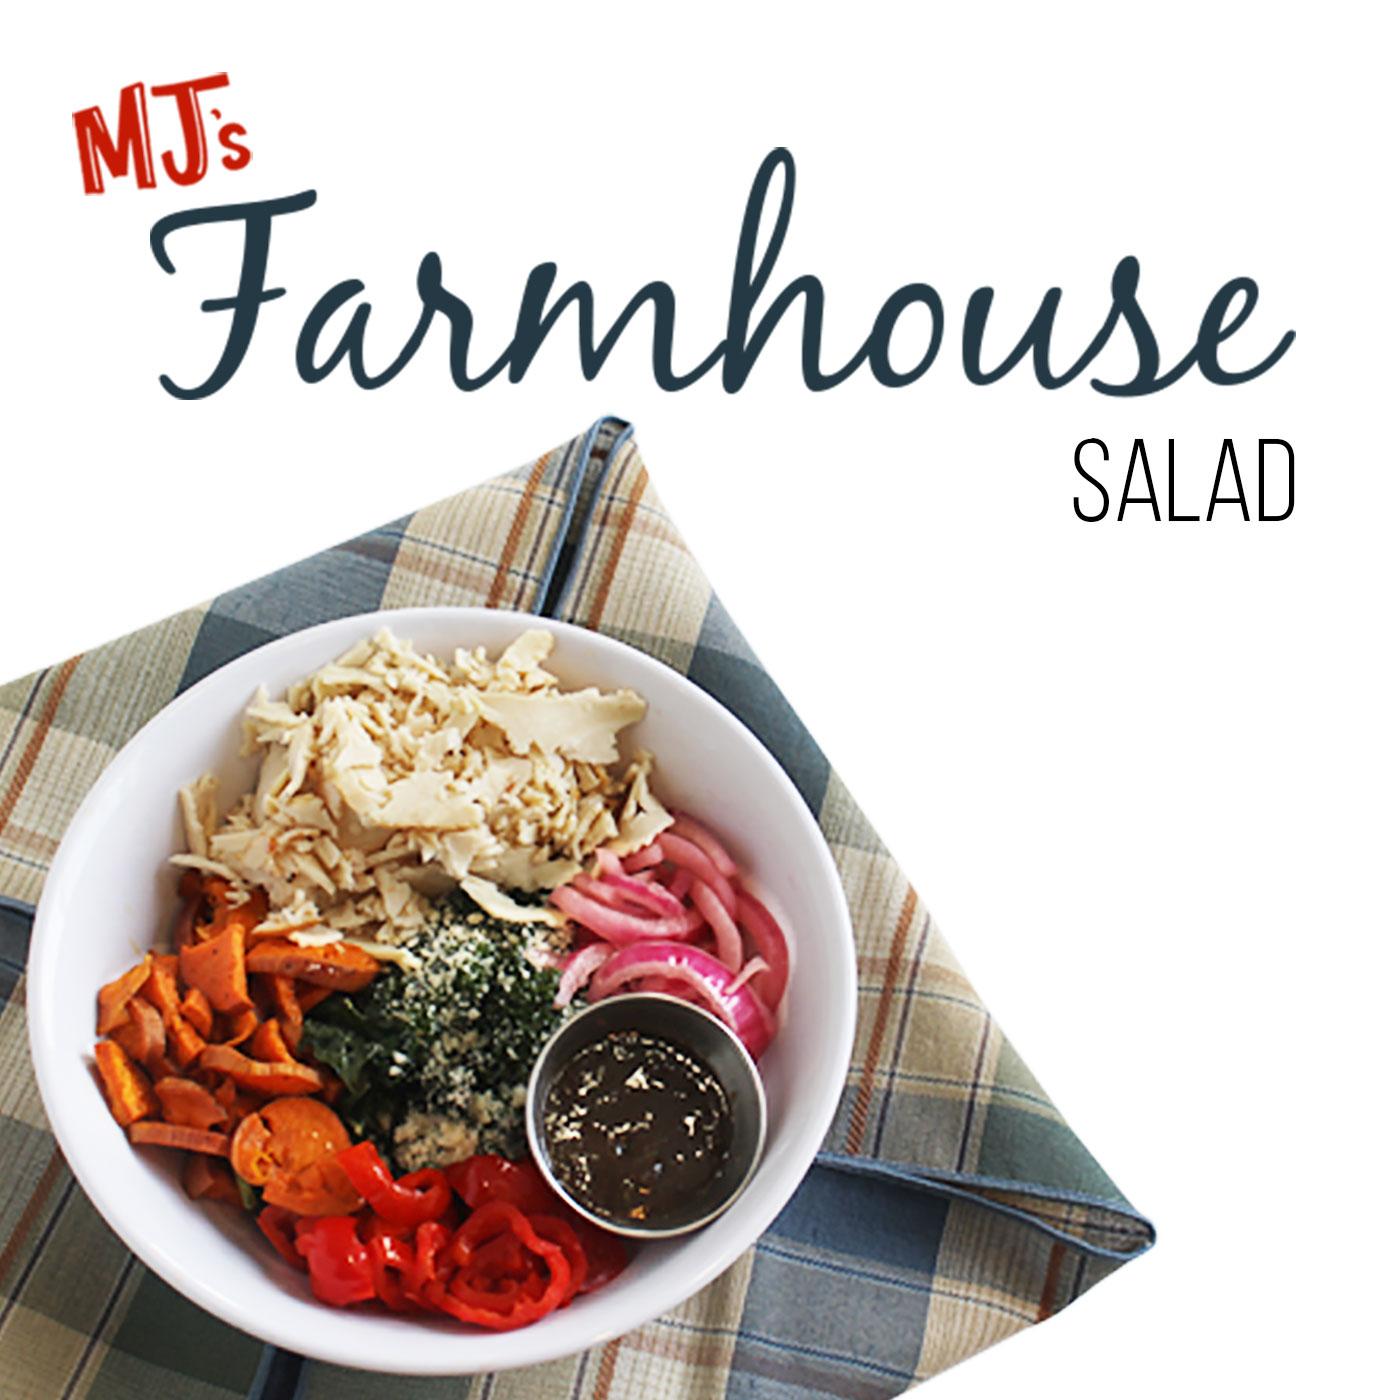 MJ Farmhouse Salad